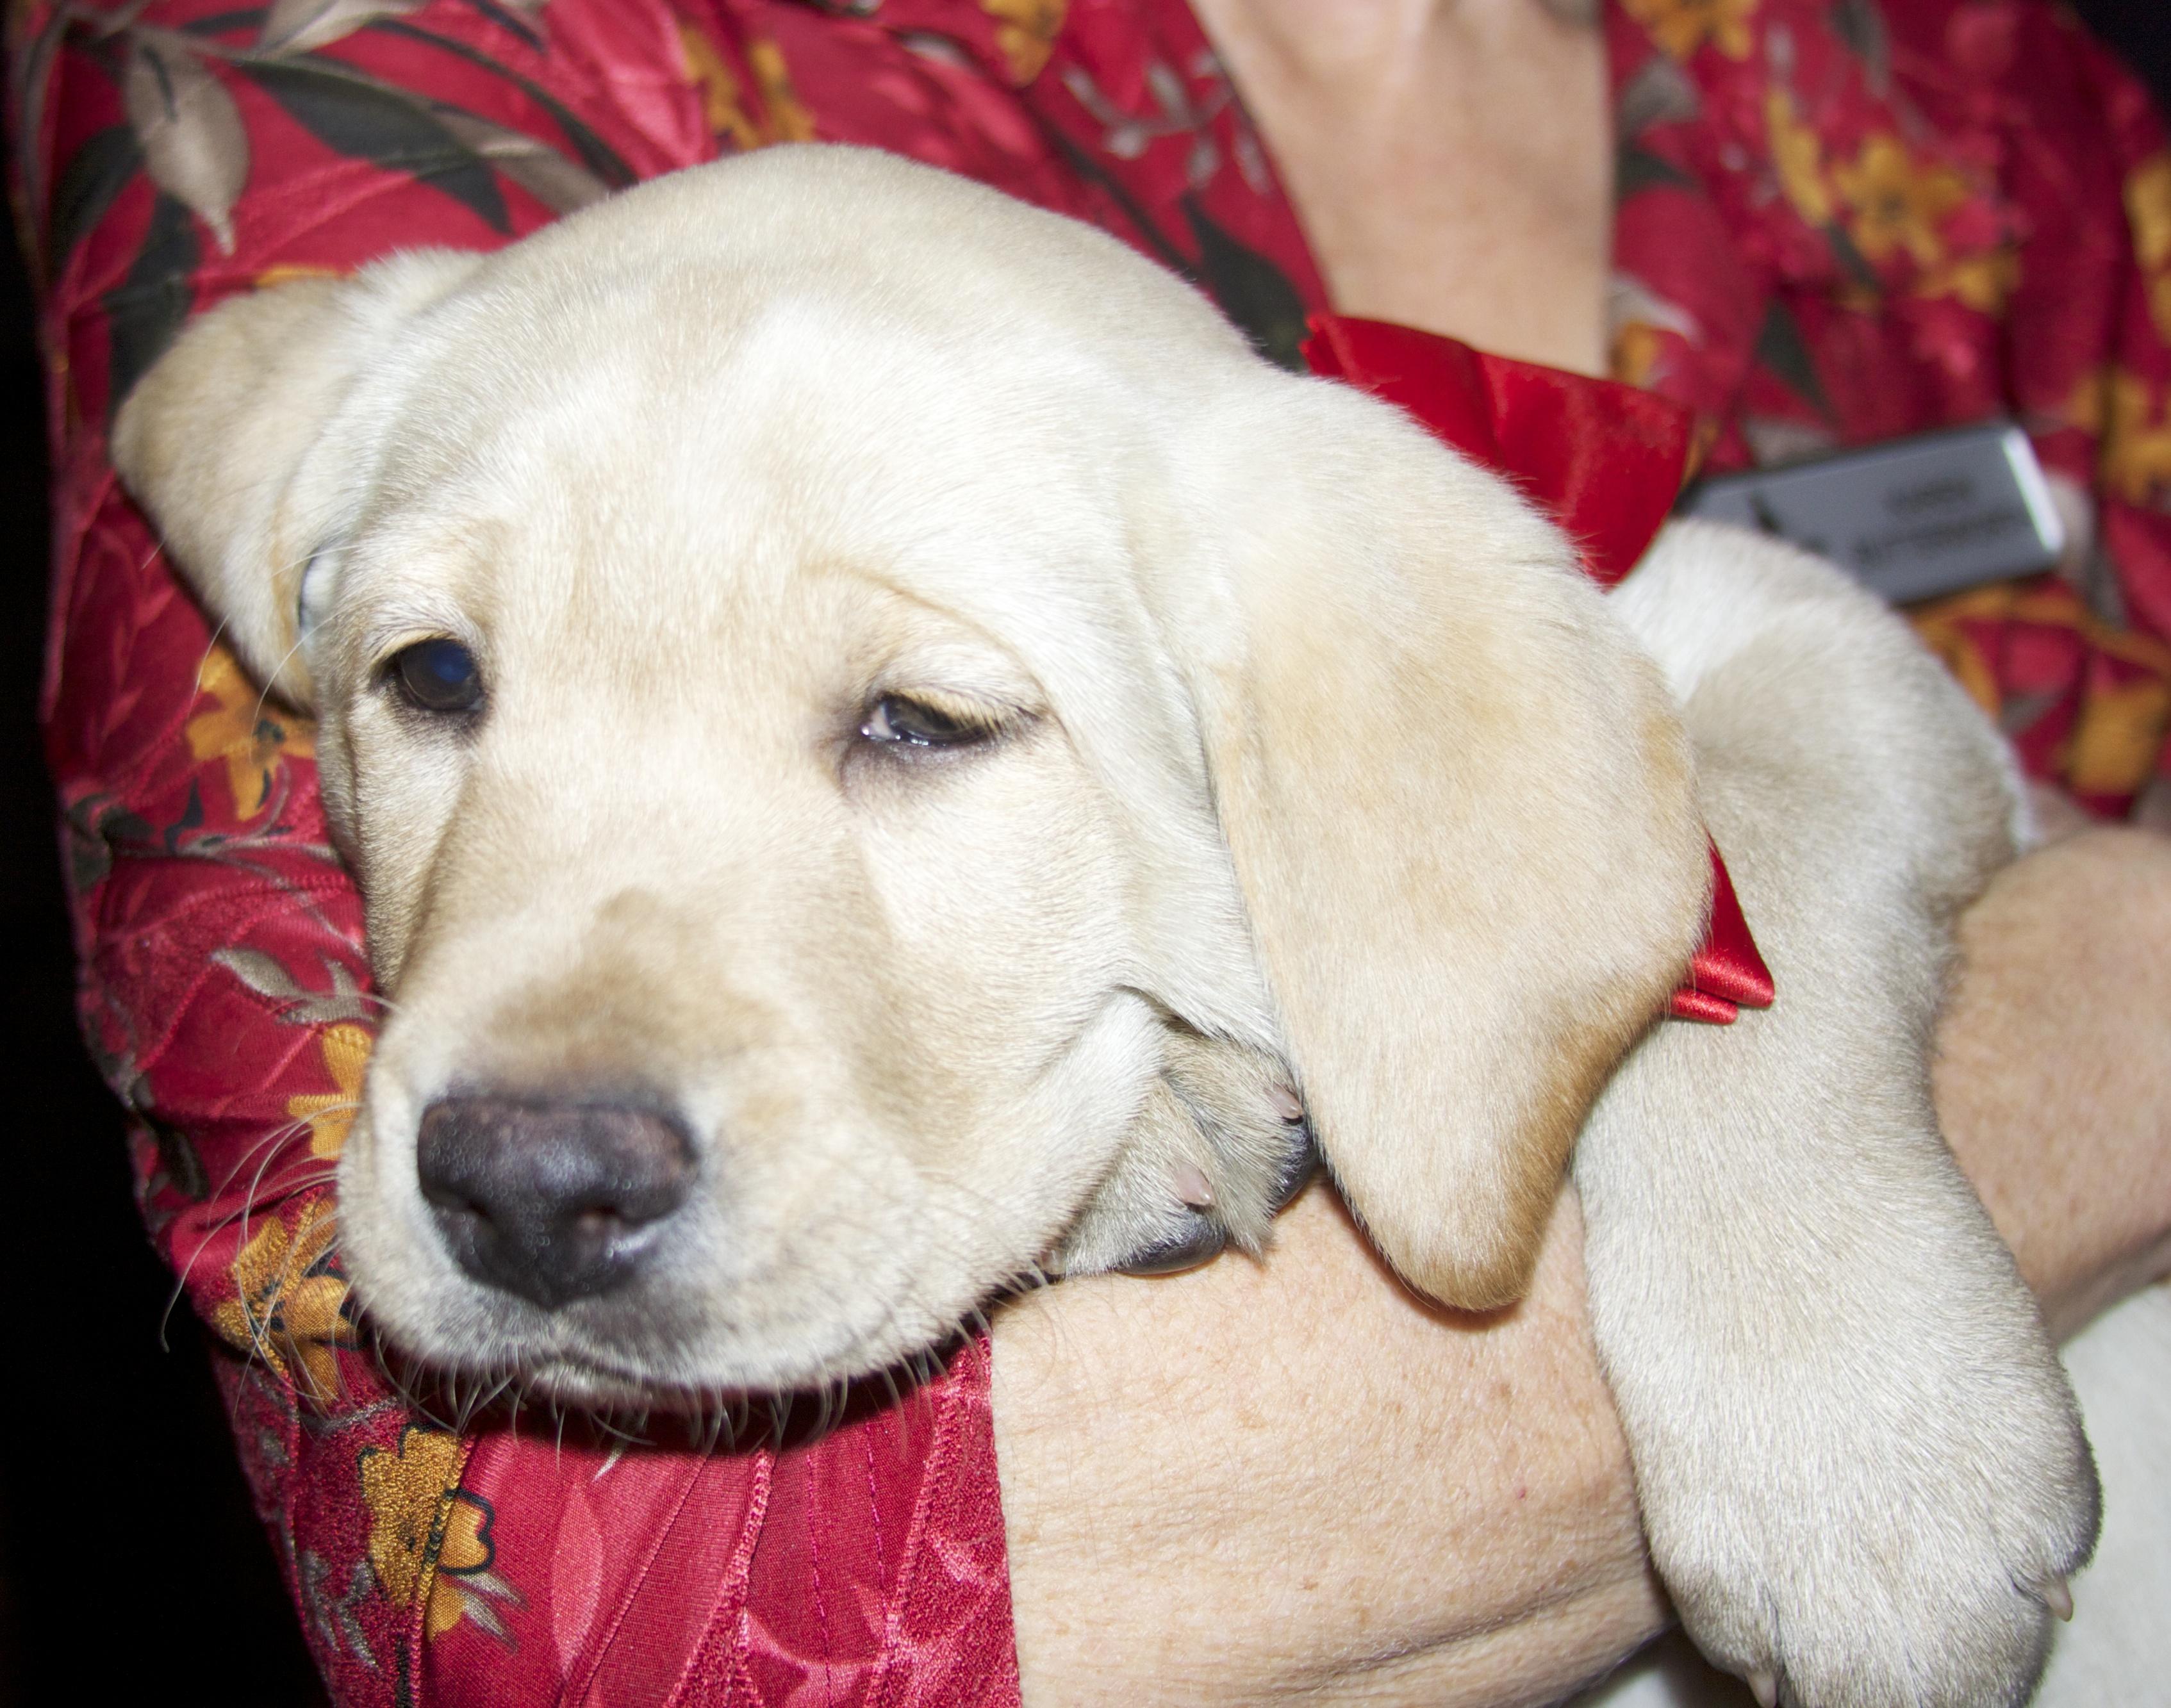 Sleepy Yellow Labrador Retriever Puppy